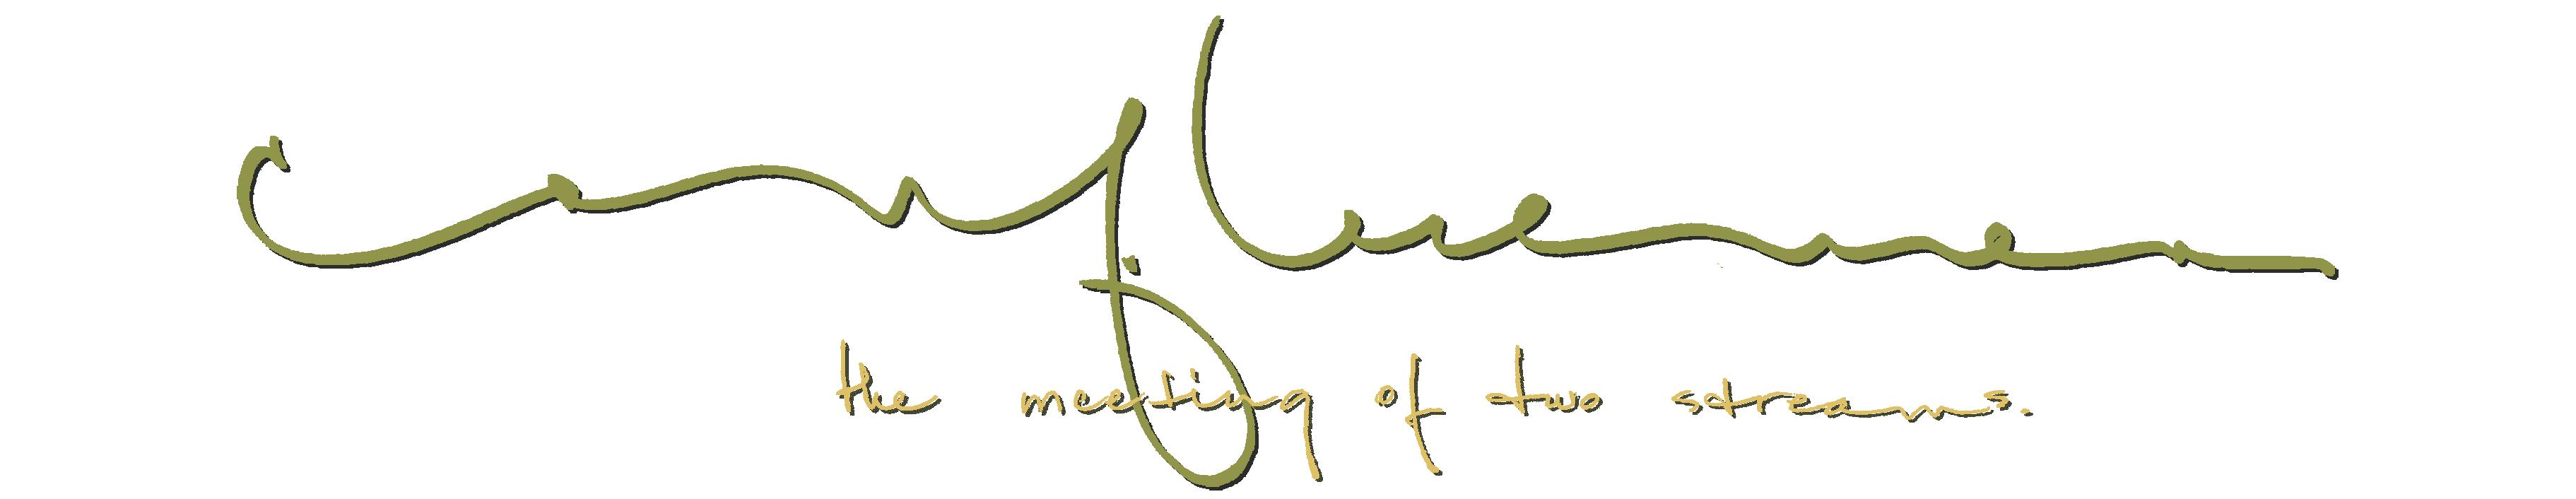 Spring 2016 confluence script